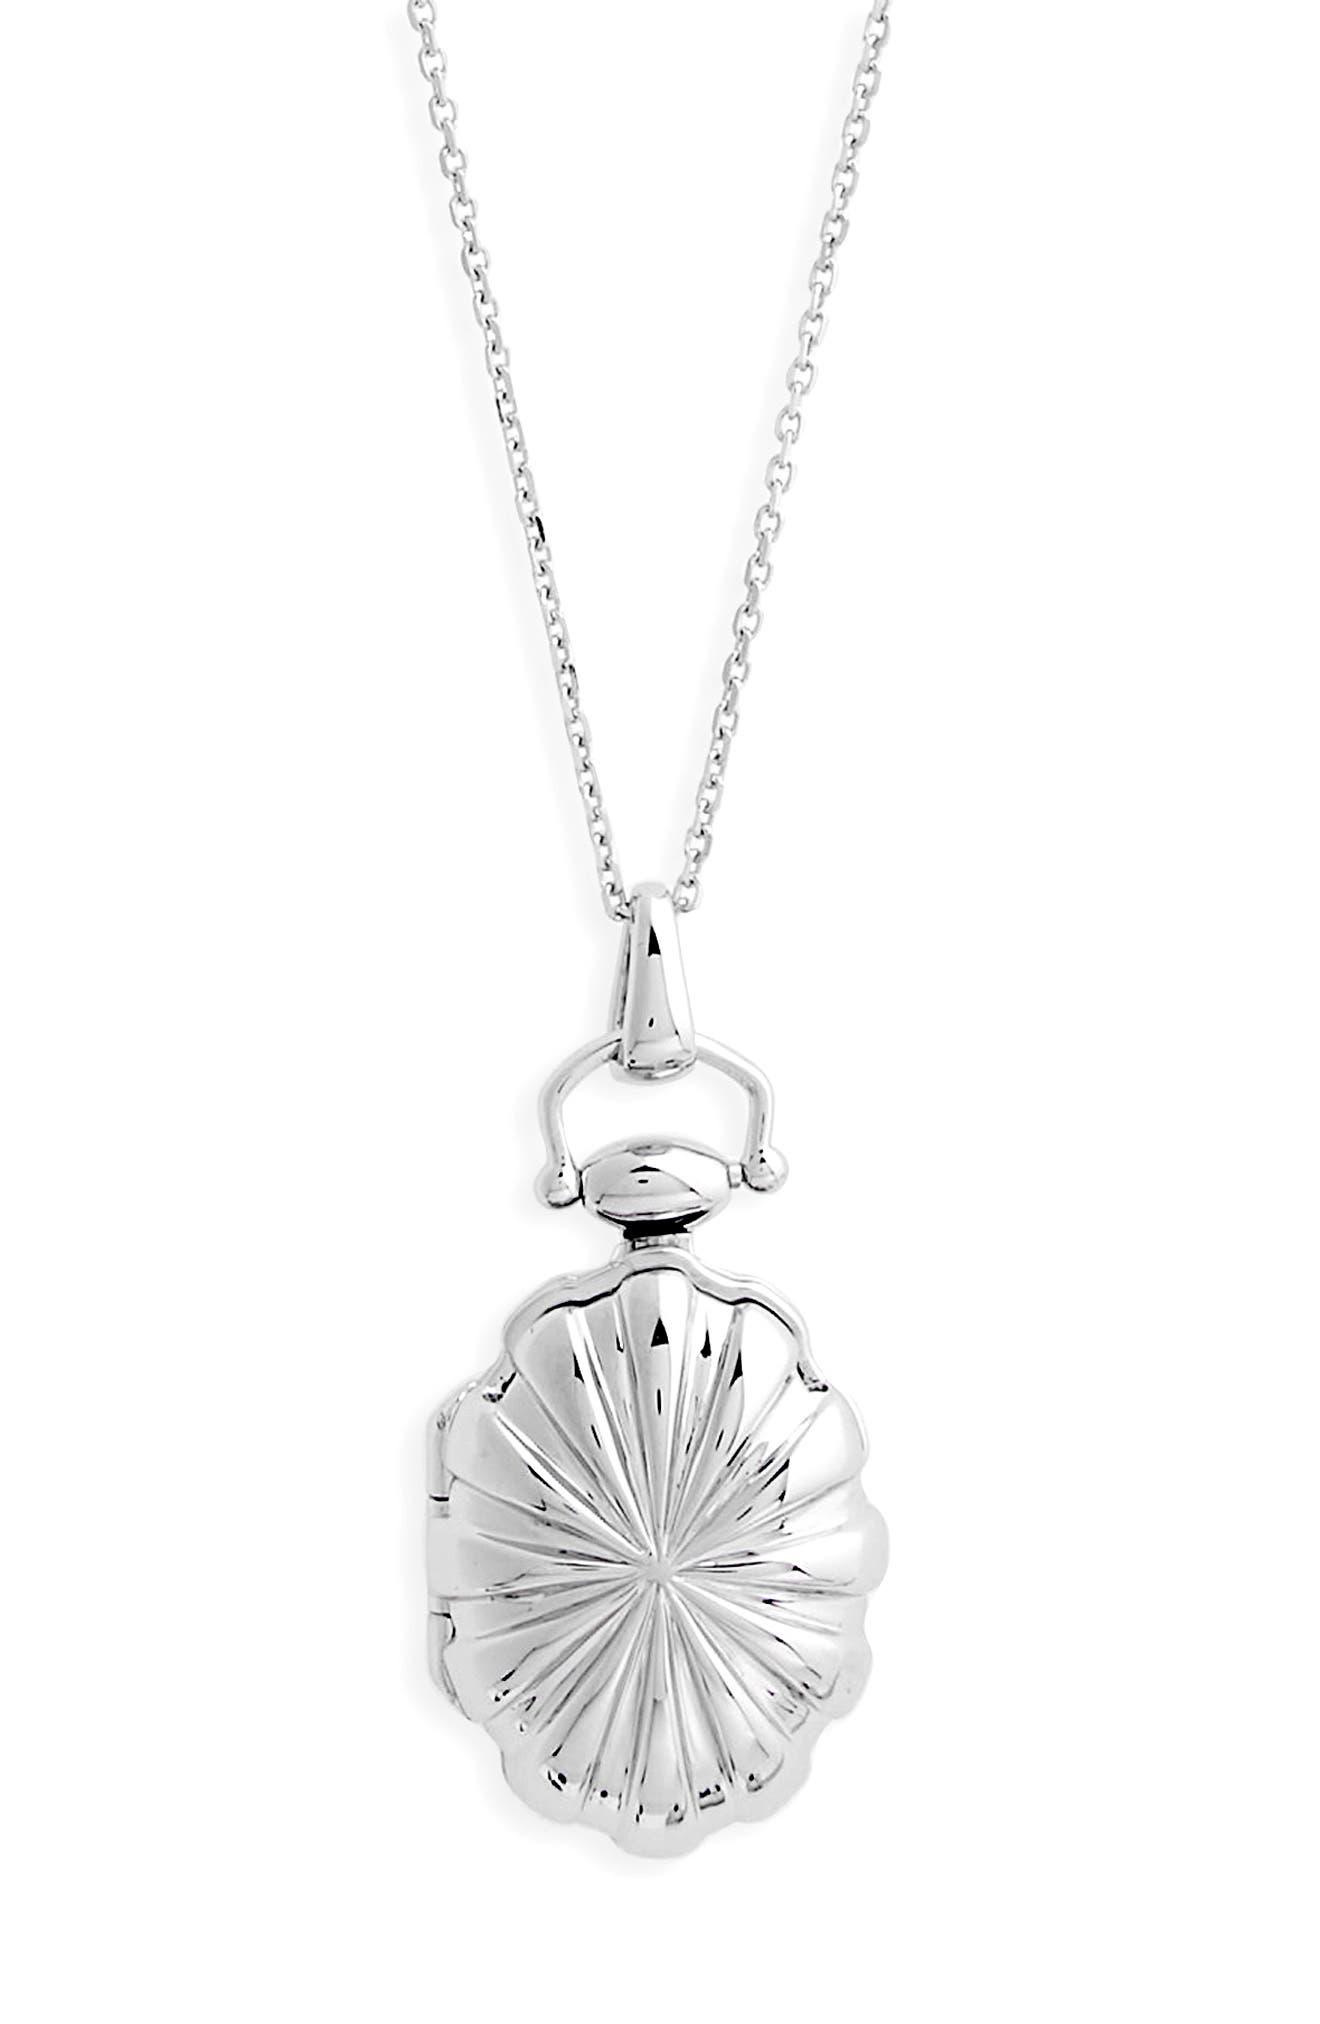 Petite Sunburst Locket Necklace,                             Alternate thumbnail 2, color,                             Sterling Silver